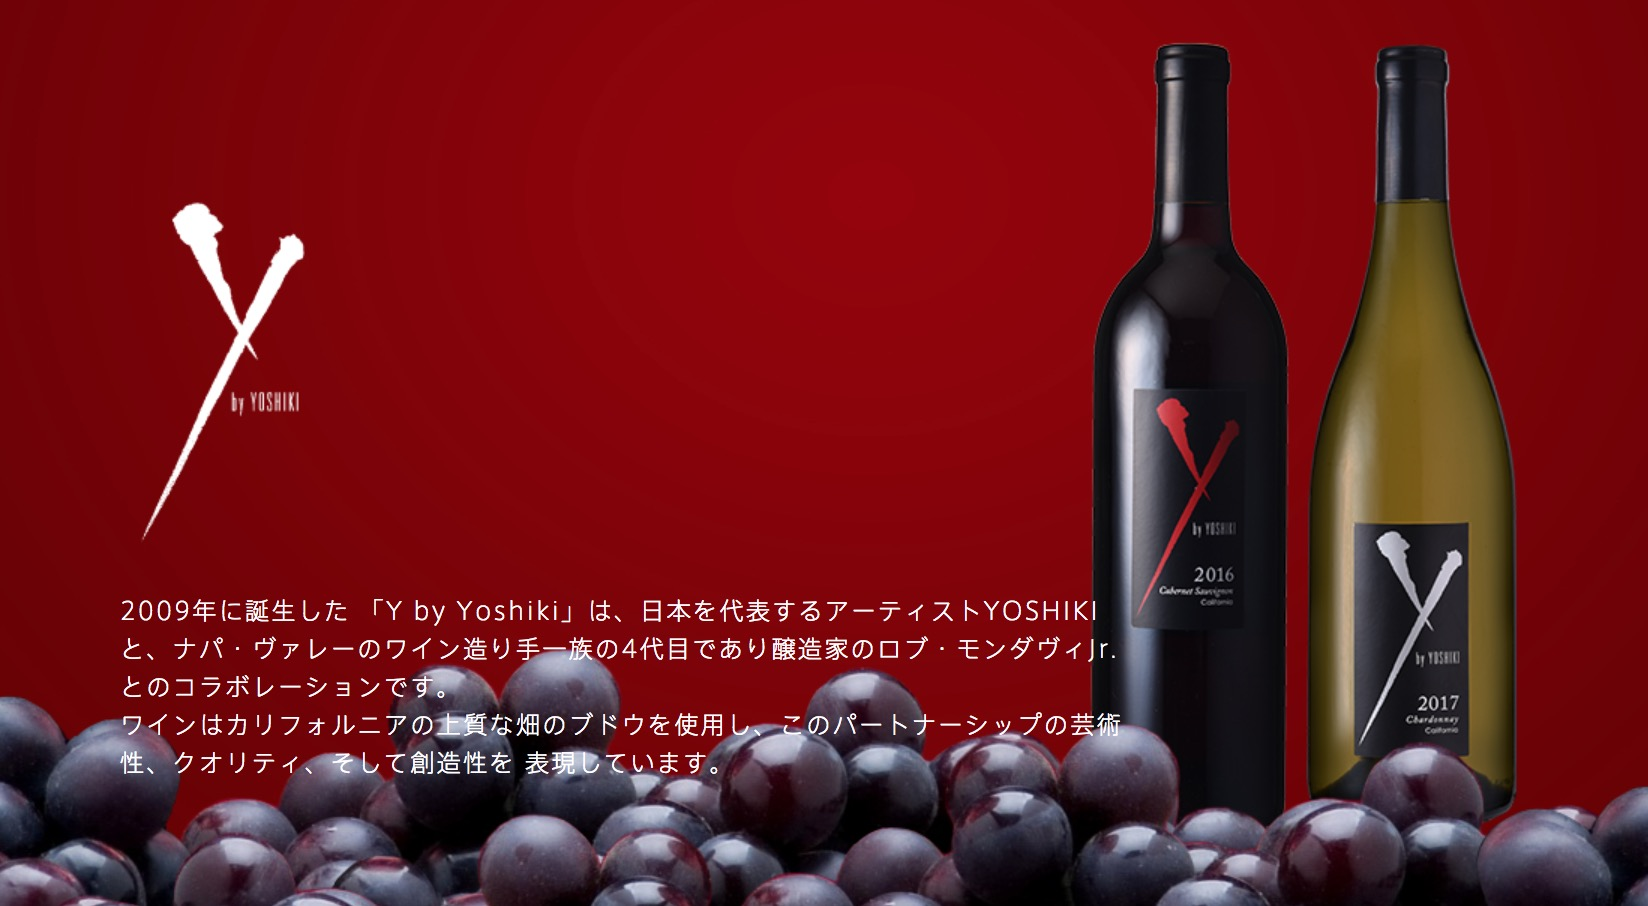 「Y by Yoshiki」新作ワイン発表会&試飲会